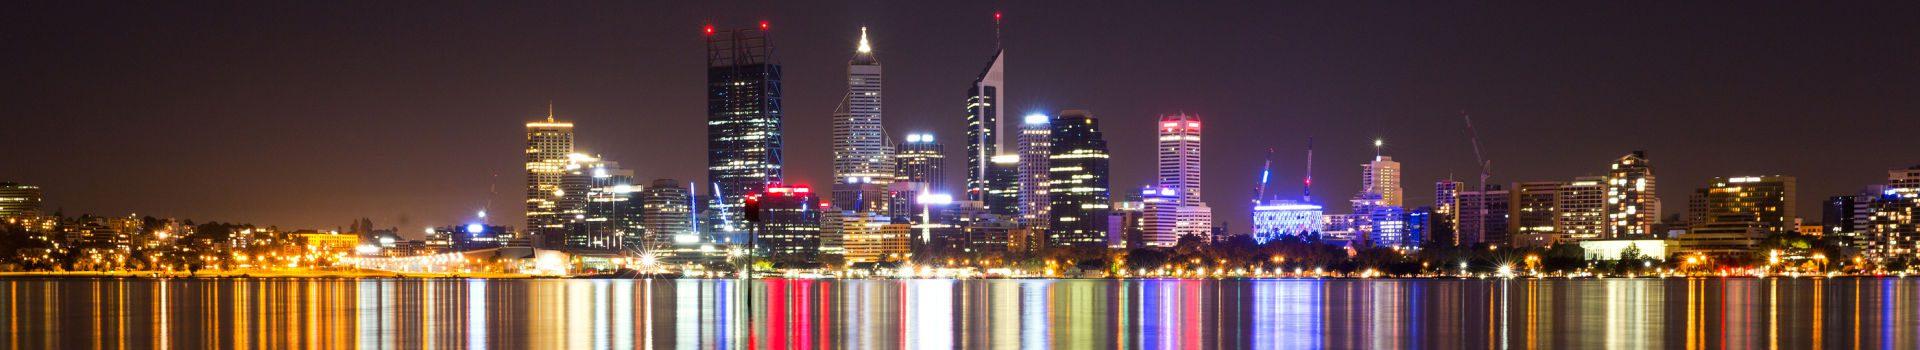 Redseason - Holidays - Perth city skyline at night